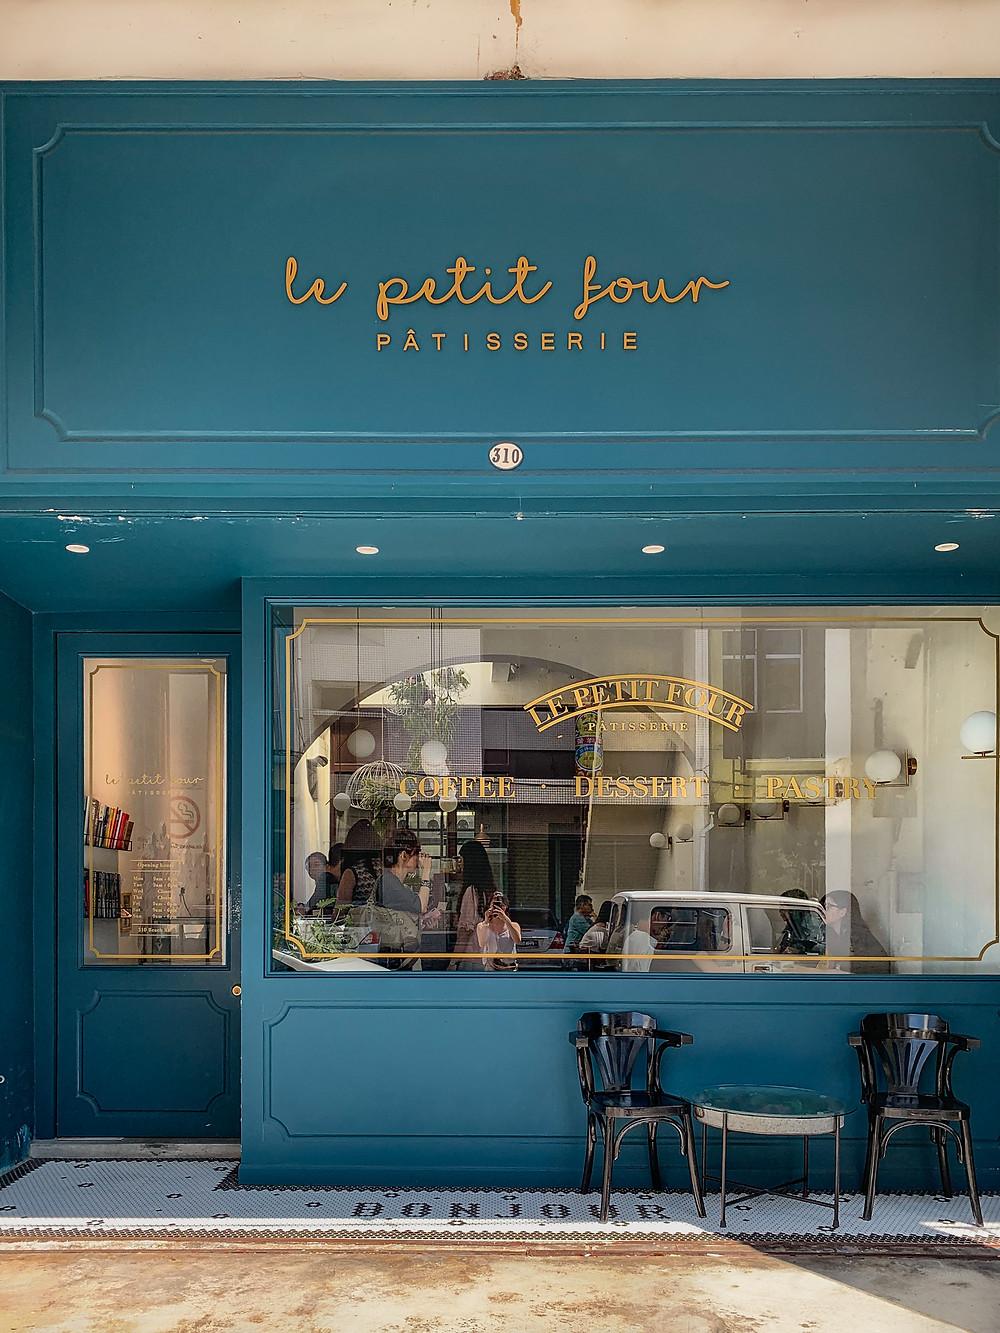 Le Petit Four Patisserie Review, blue cafe facade, RollingBear Travels blog.